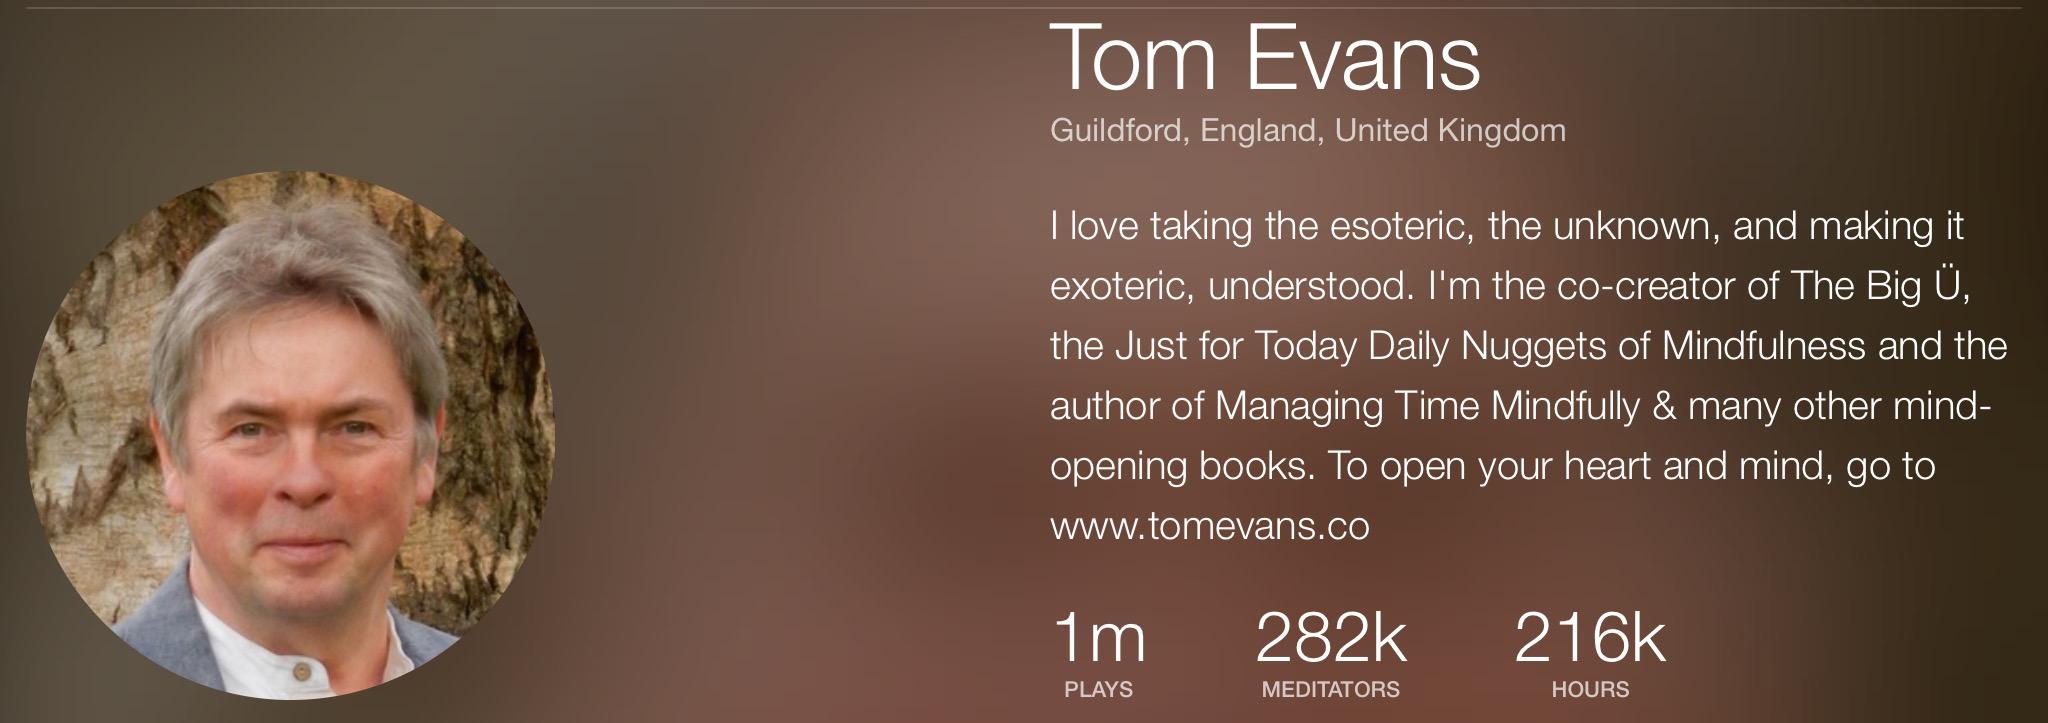 Tom Evans on Insight Timer